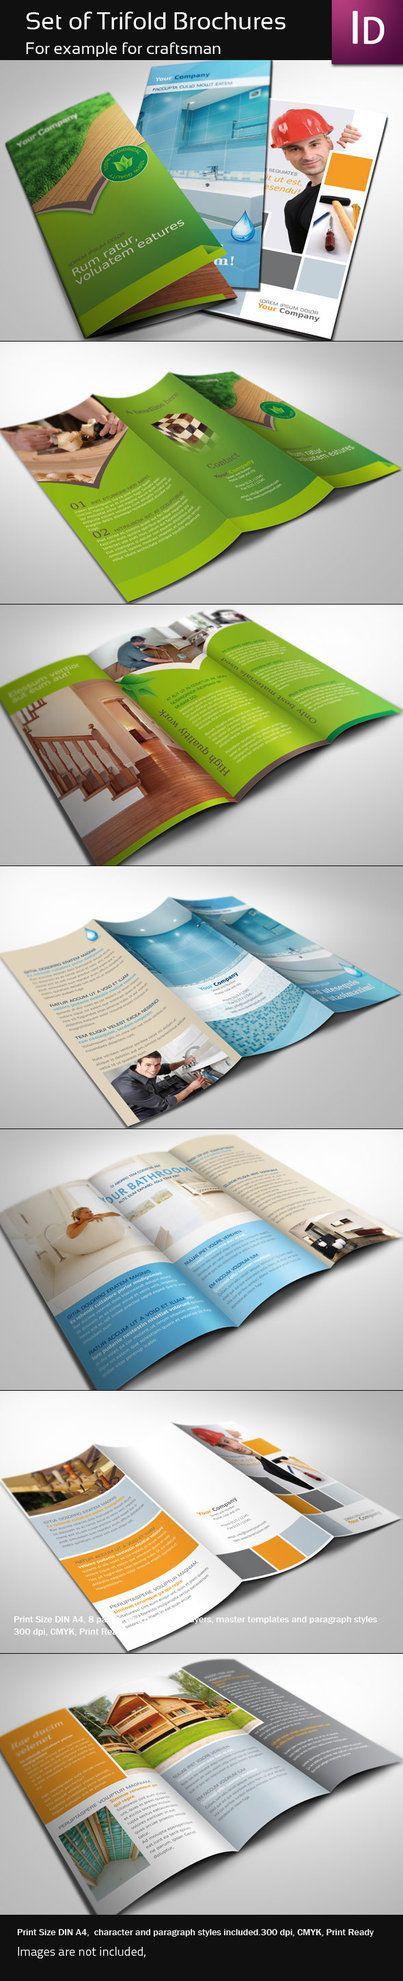 30 Contoh Desain Brosur Lipat Tiga | 24_Trifold-Brochures